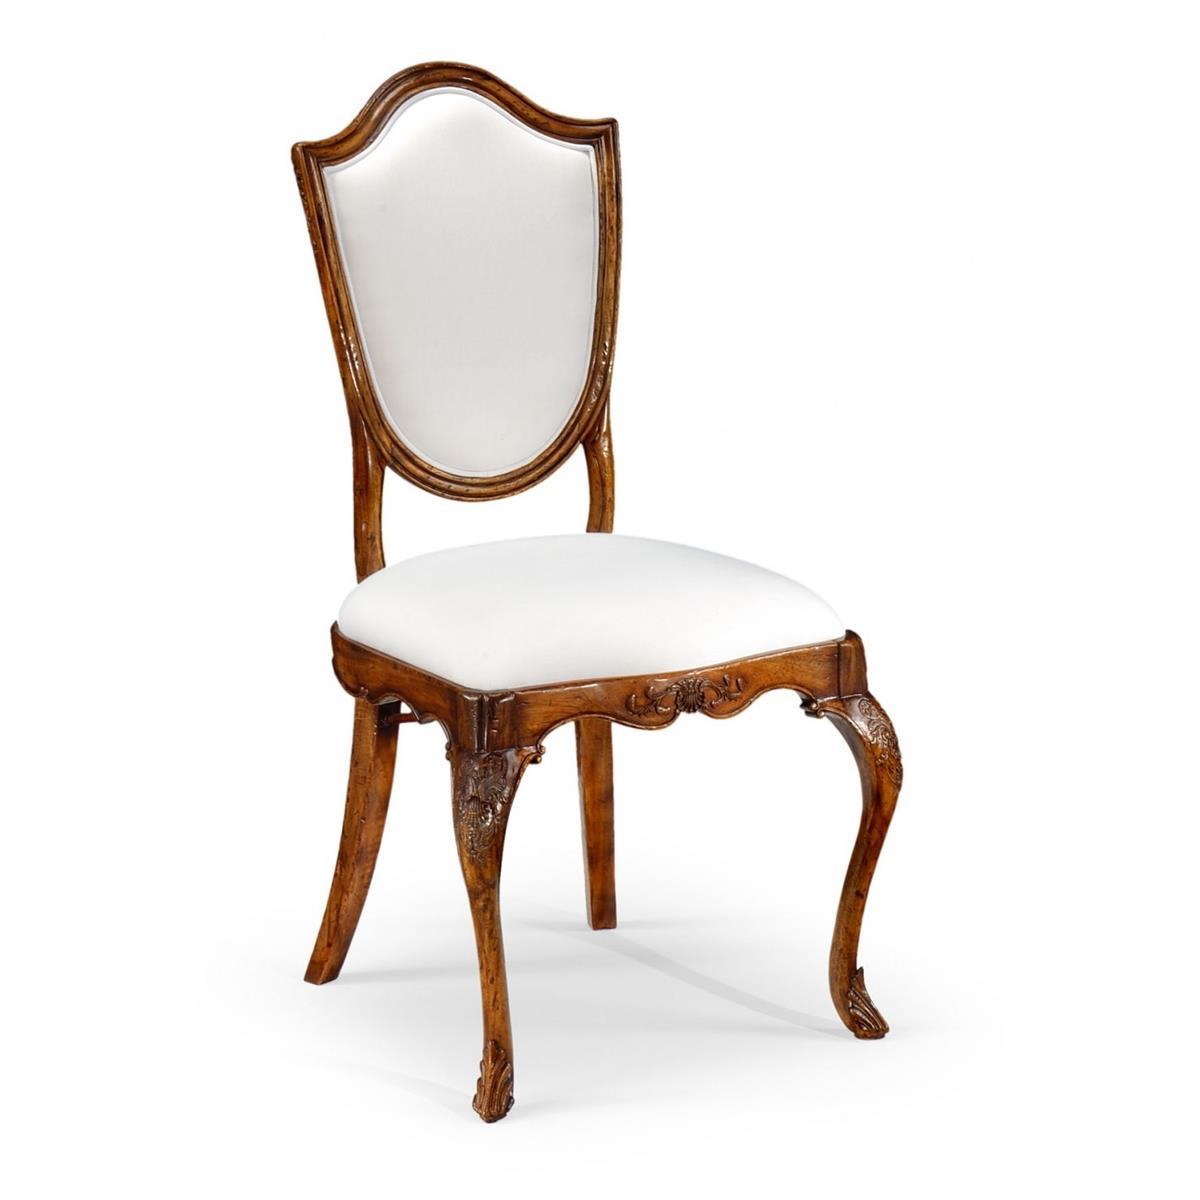 492646 Upholstered Shield Back Chair (Side) - на 360.ru: цены, описание, характеристики, где купить в Москве.